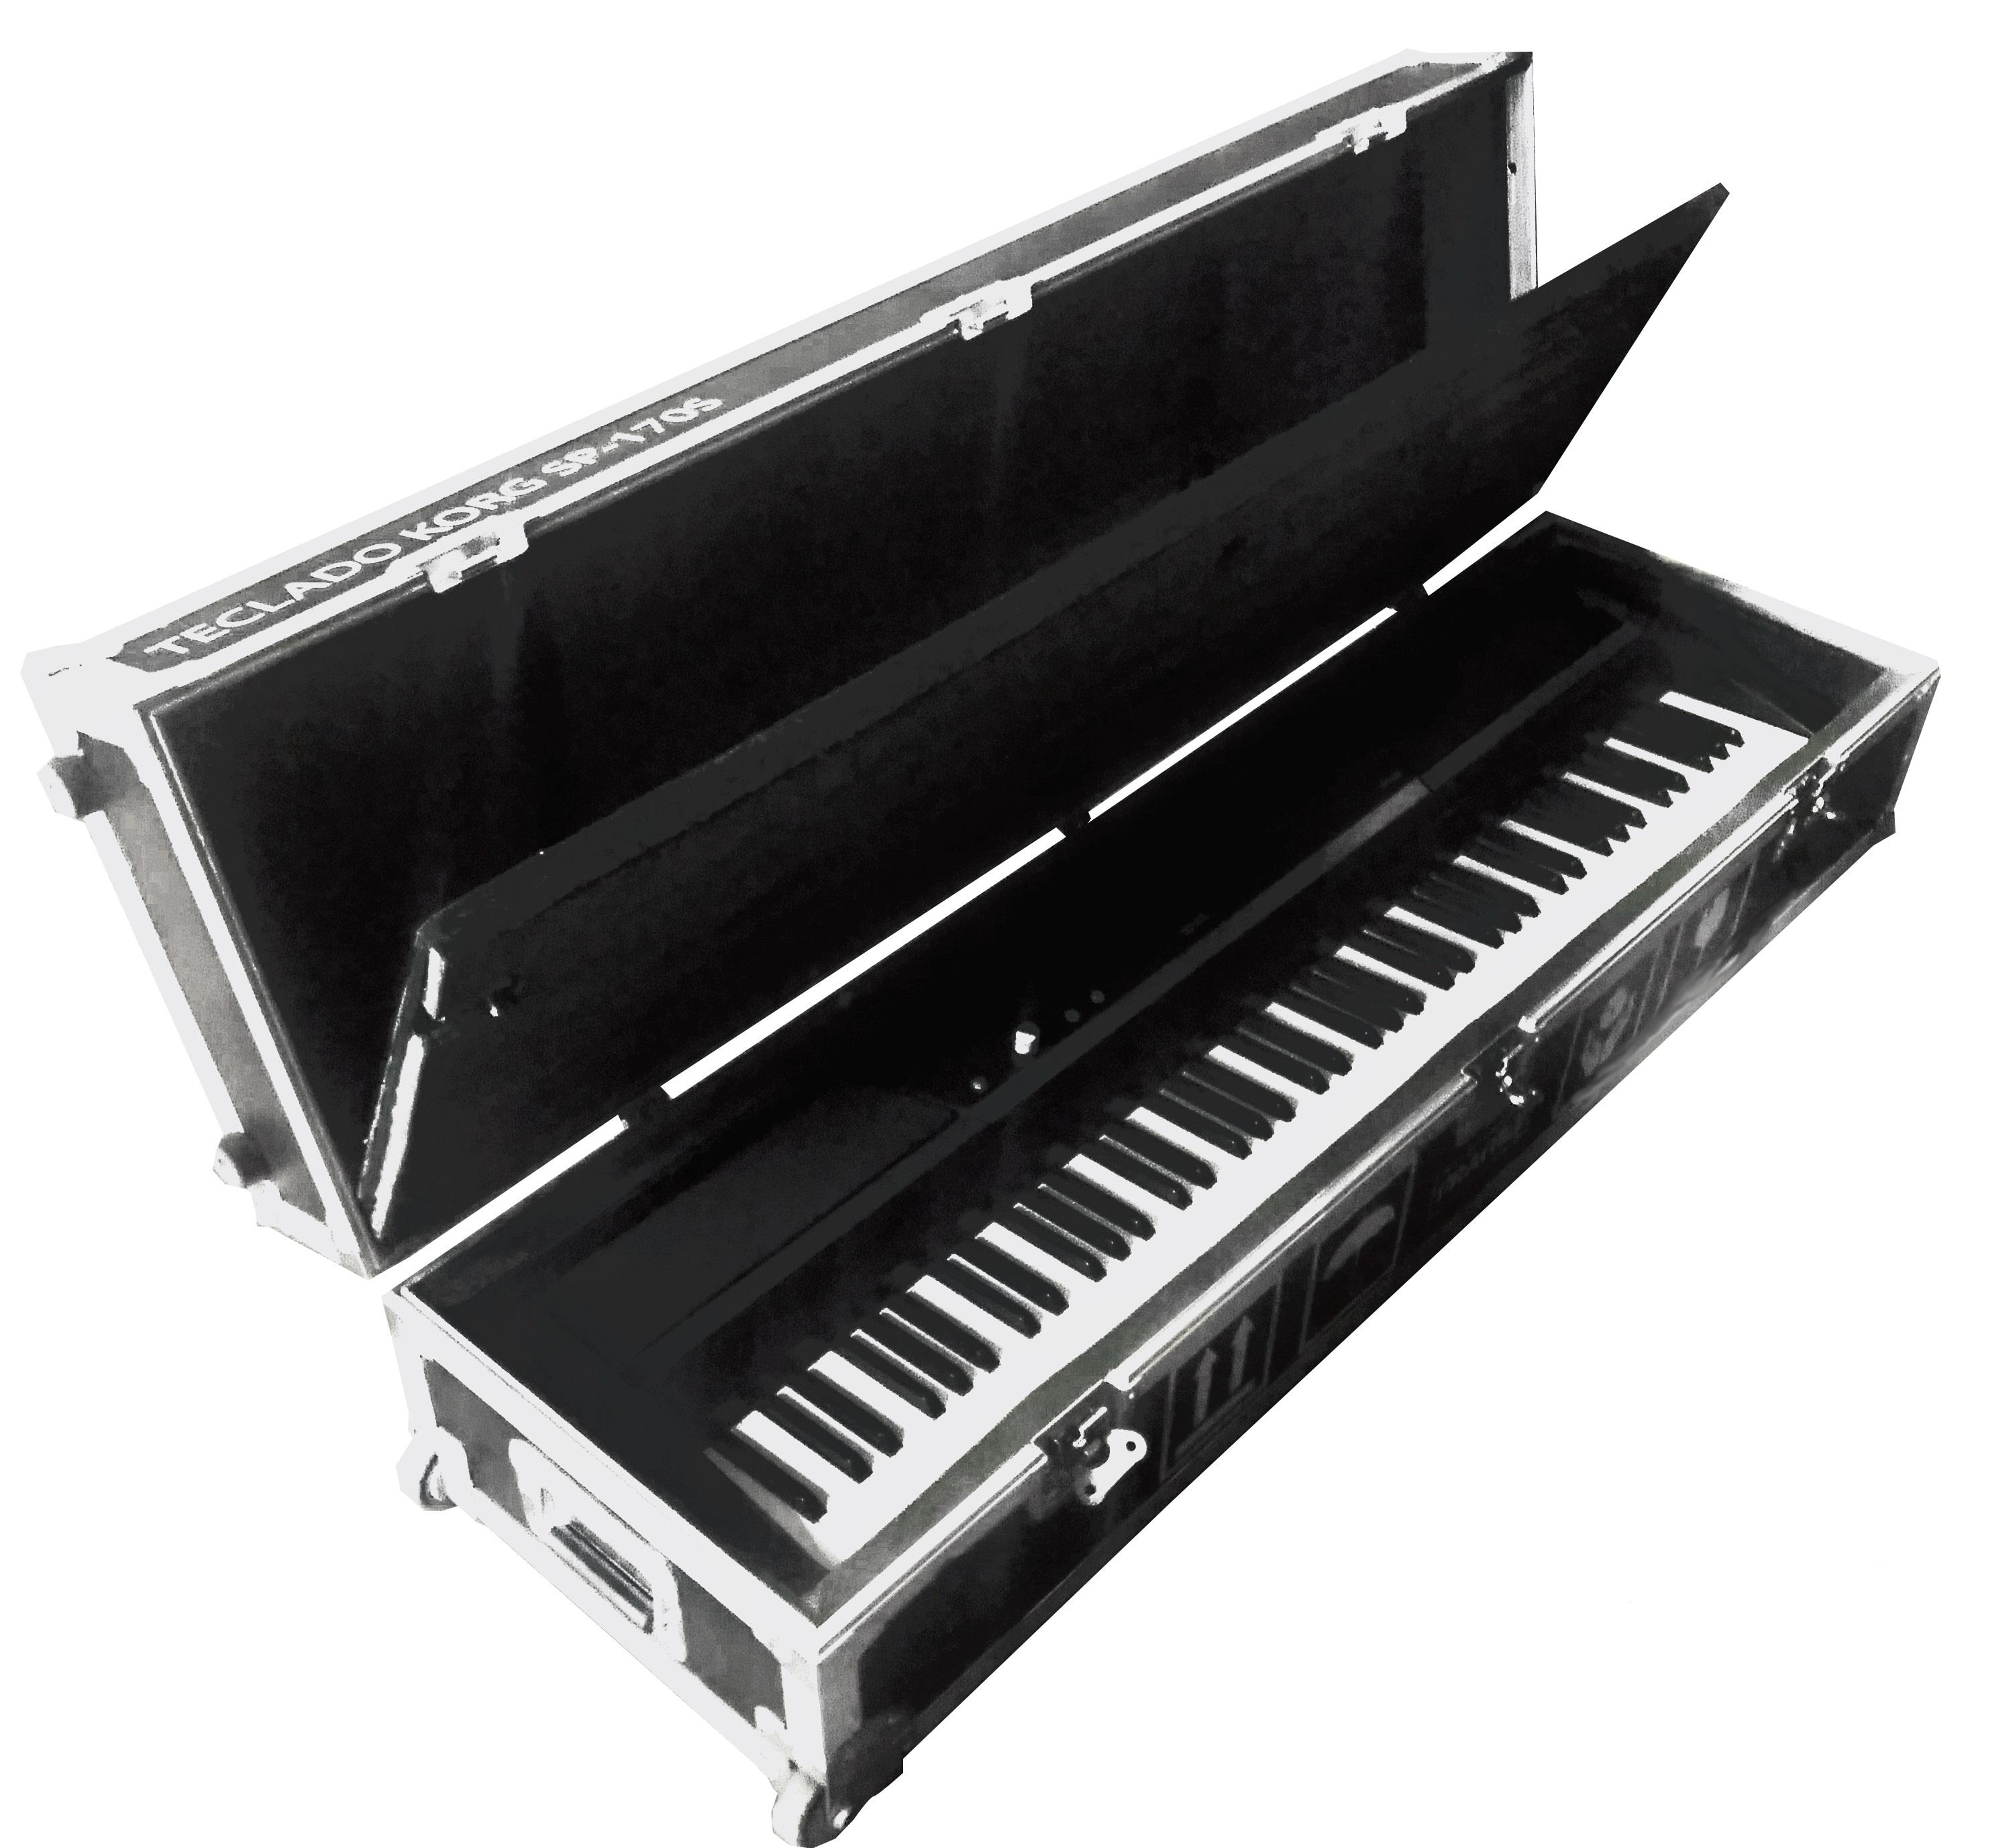 RACK CASE PARA PIANO